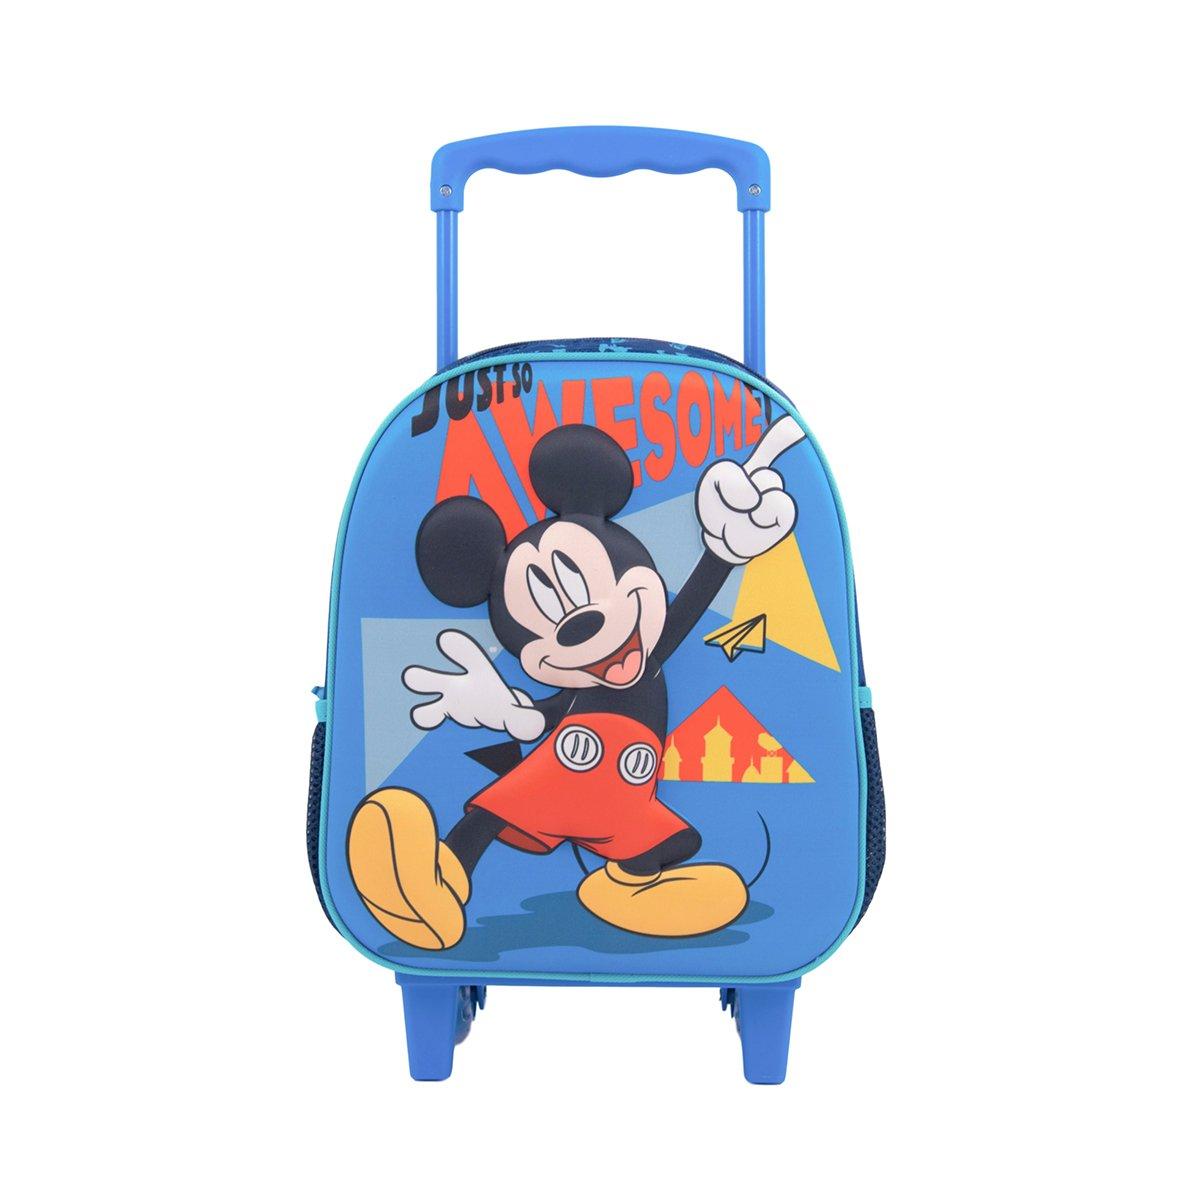 Ghiozdan tip troler Disney Mickey Mouse, 3D, Mic